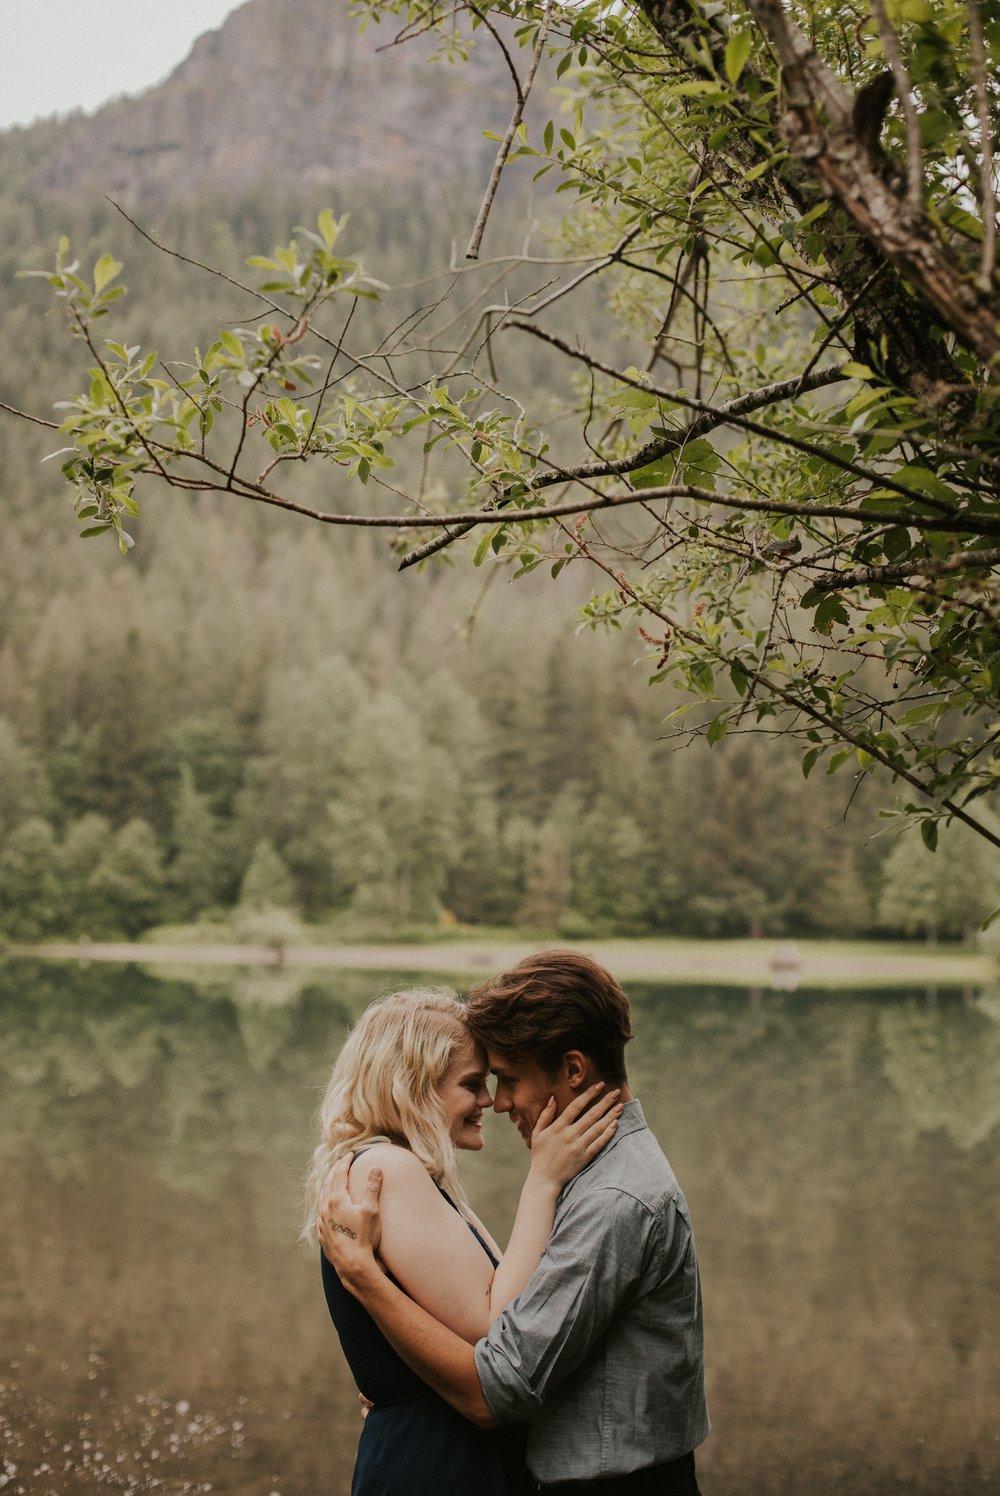 Sarah_Anne_Photo_Rattlesnake_Lake_Engagement 2.jpg